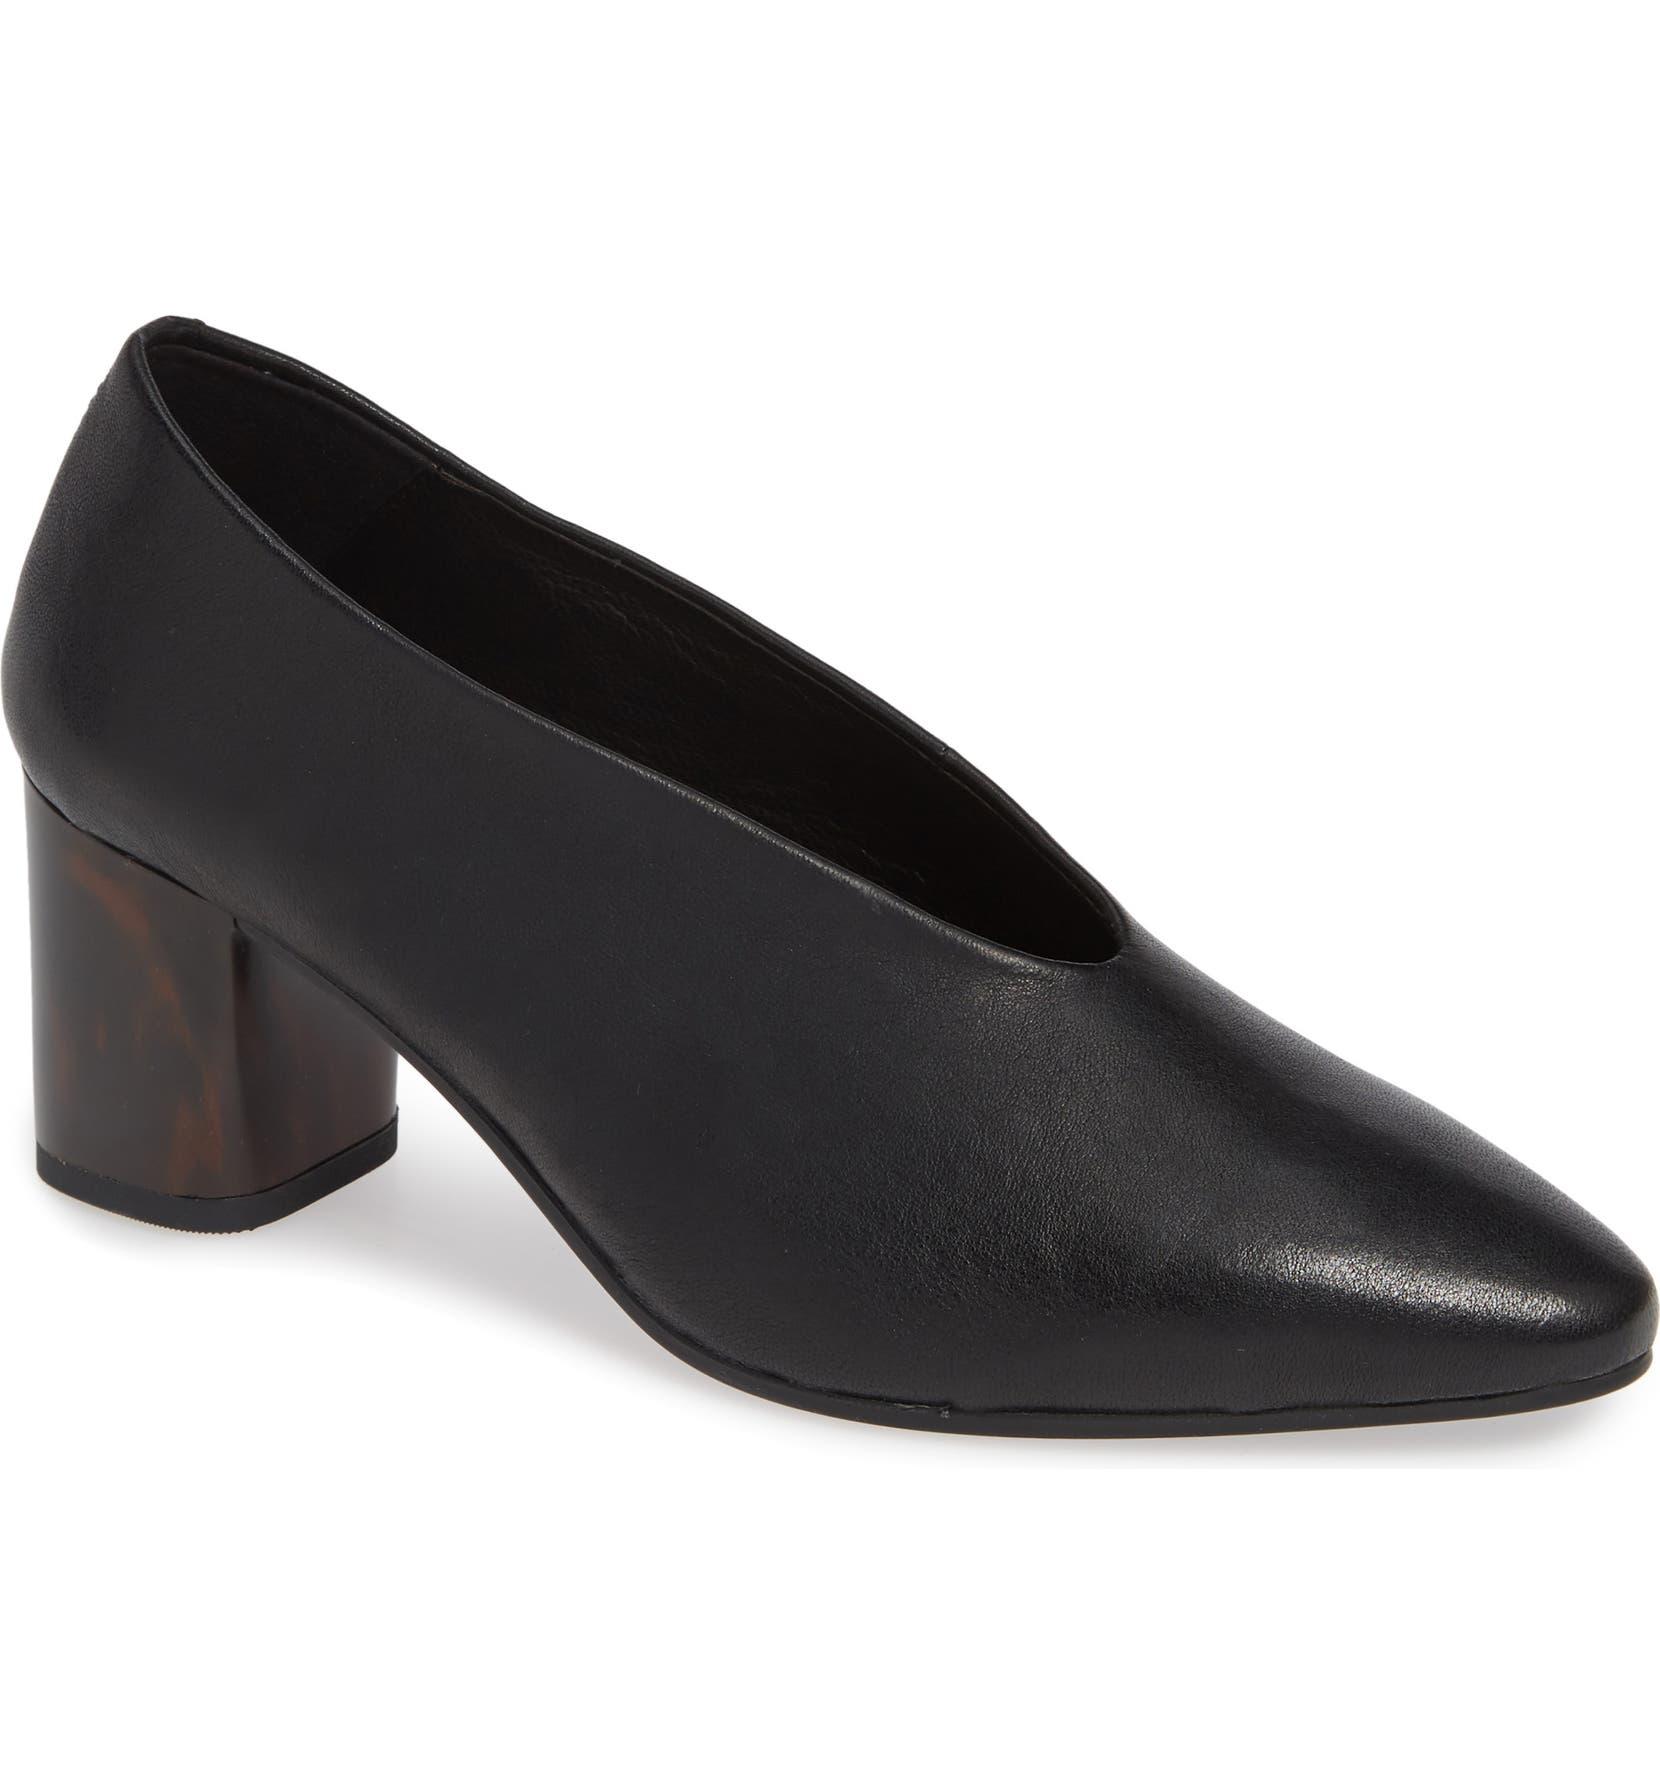 c47515ccf7b4 Vagabond Shoemakers Eve Pump (Women)